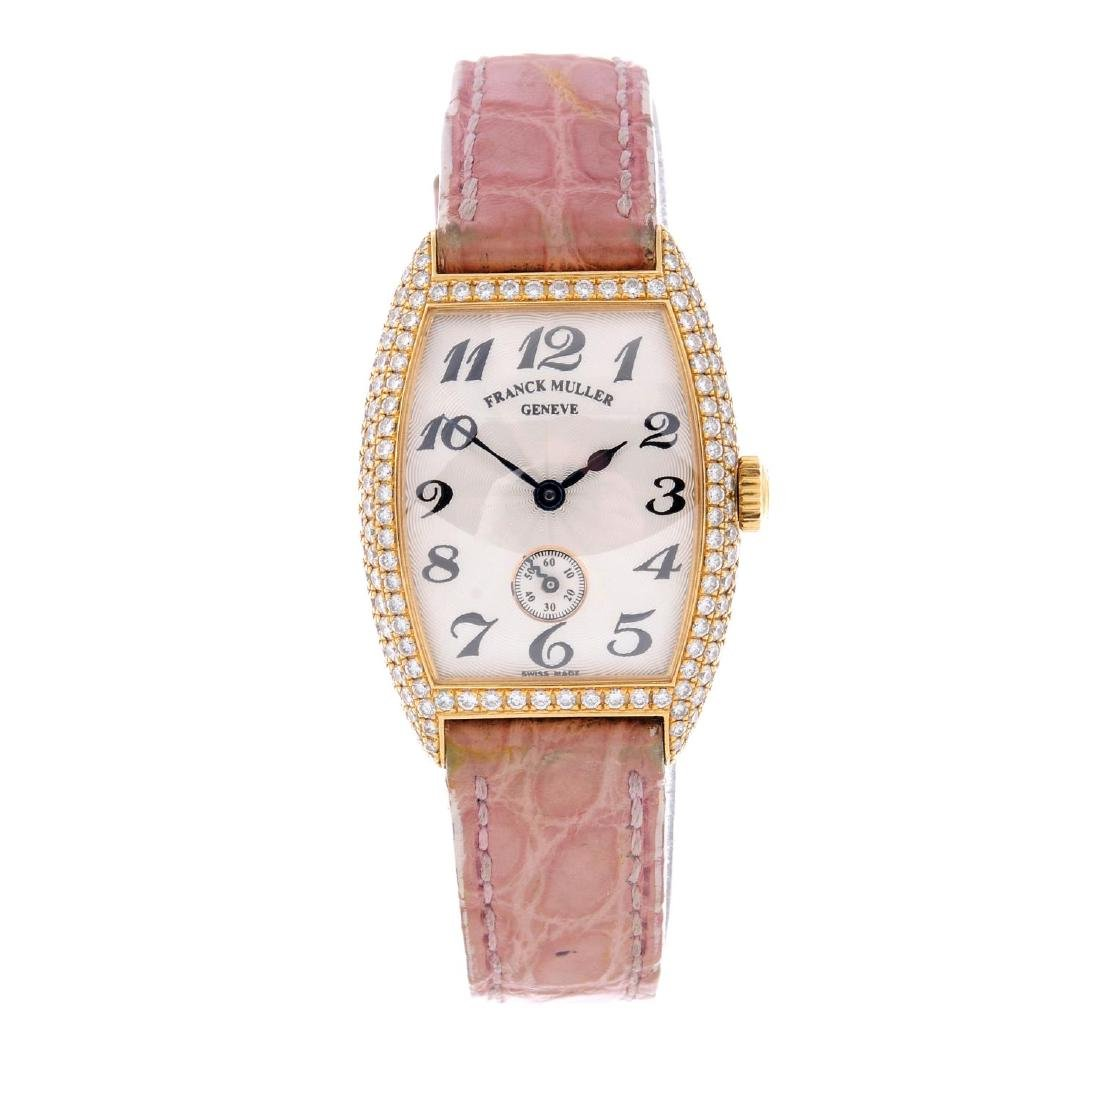 FRANCK MULLER - a lady's Cintree Curvex wrist watch.